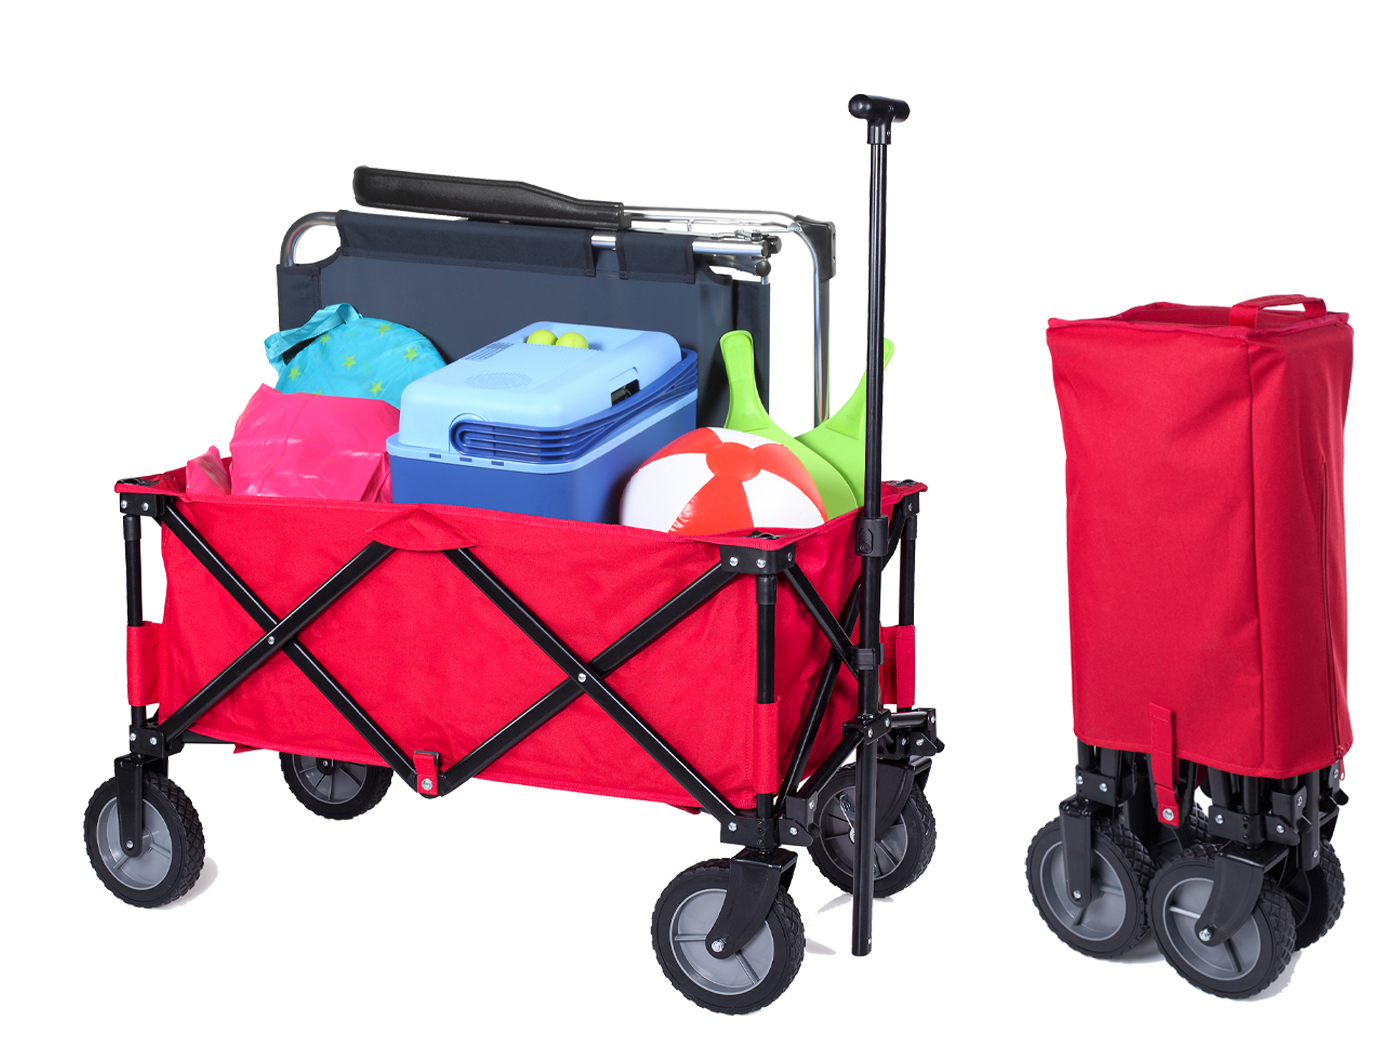 bollerwagen faltbar klappbar rot handwagen transportkarre. Black Bedroom Furniture Sets. Home Design Ideas